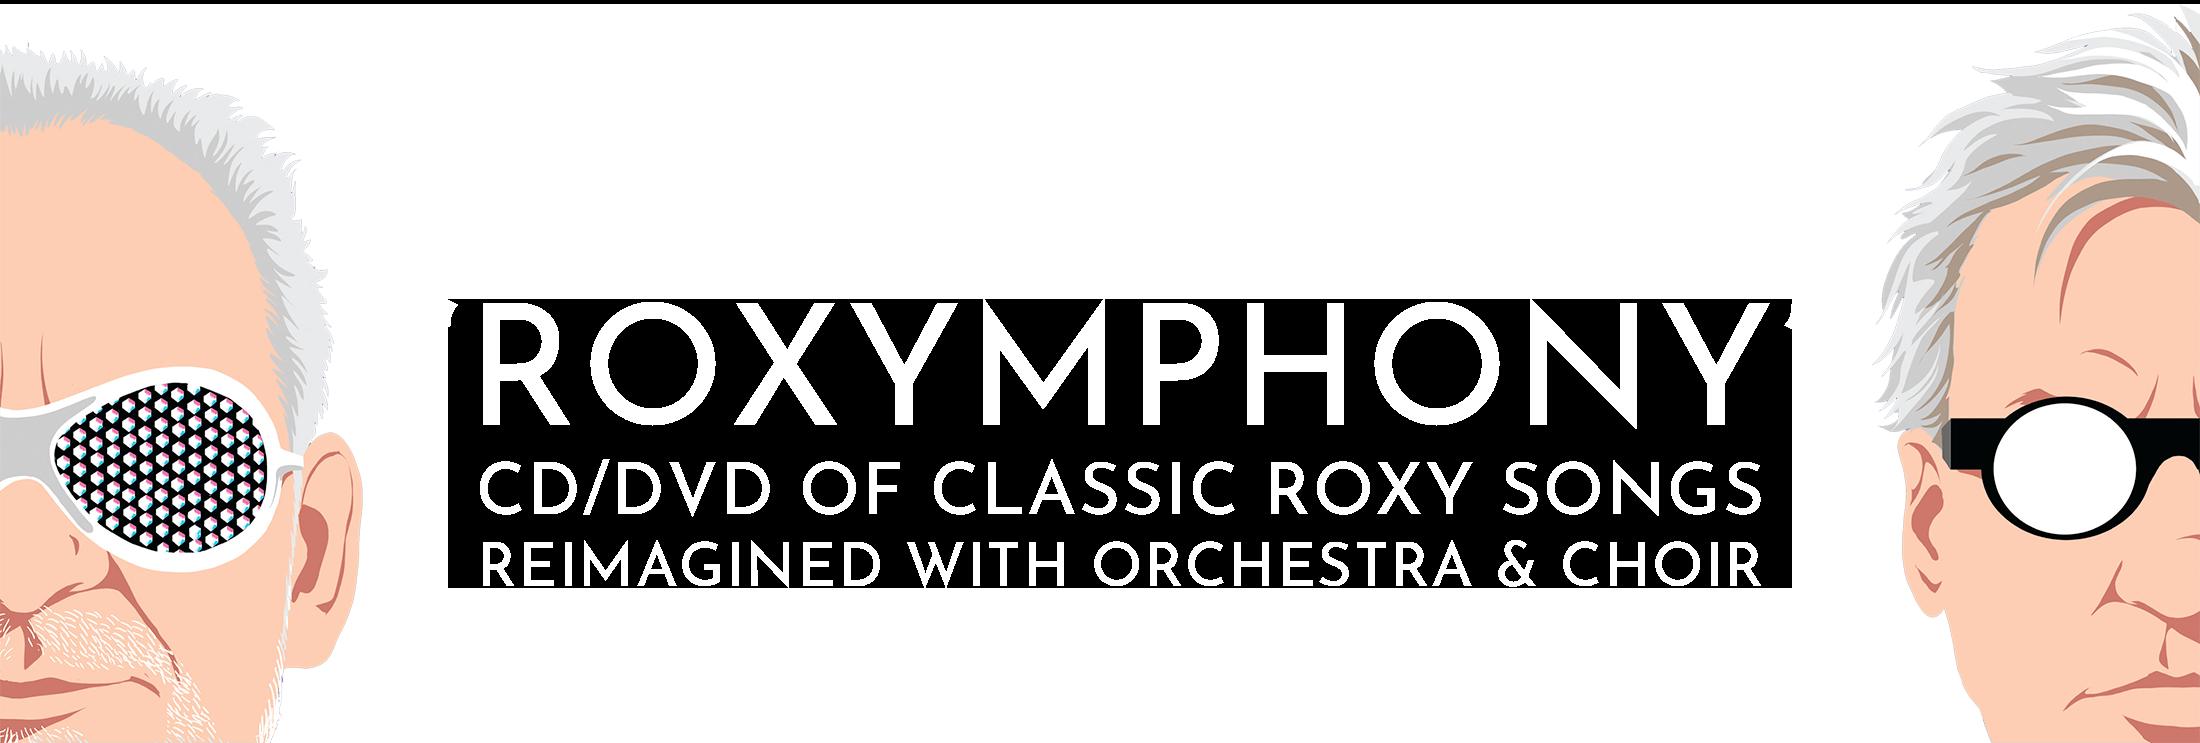 Roxymphony Album Phil Manzanera & Andy Mackay